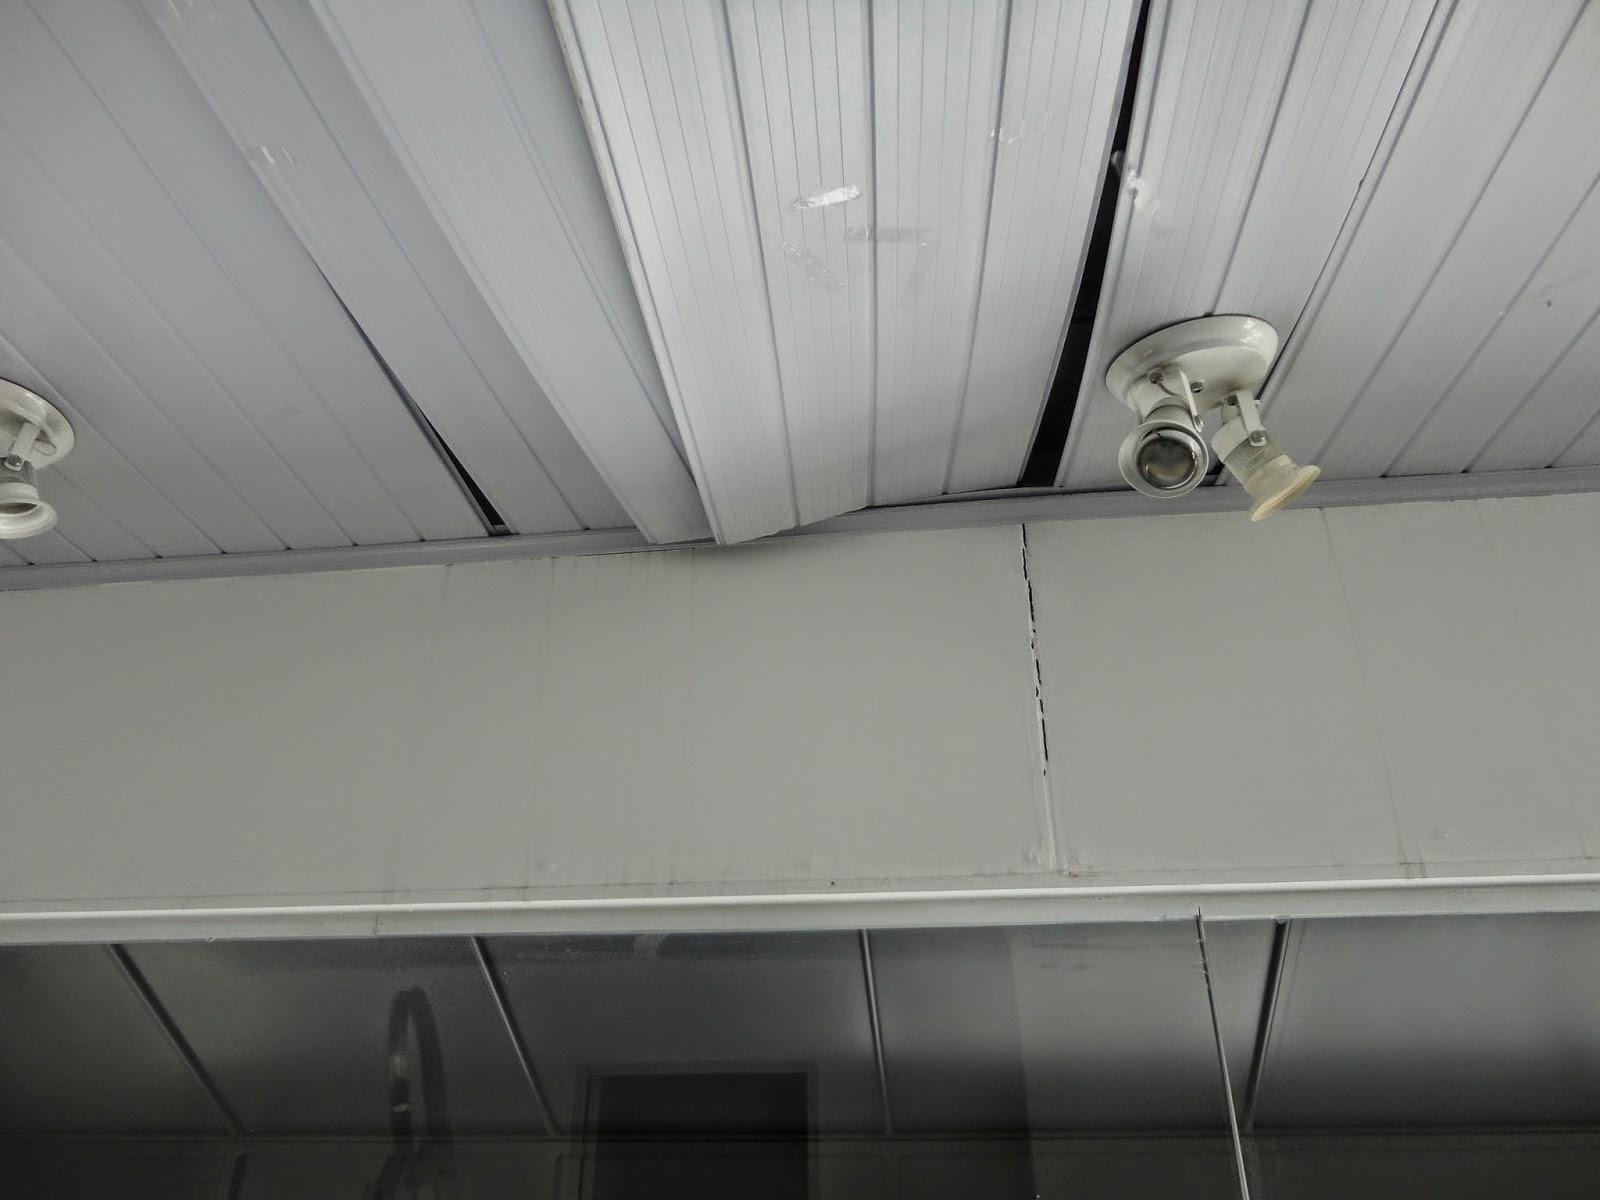 Forro PVC mau instalado caindo